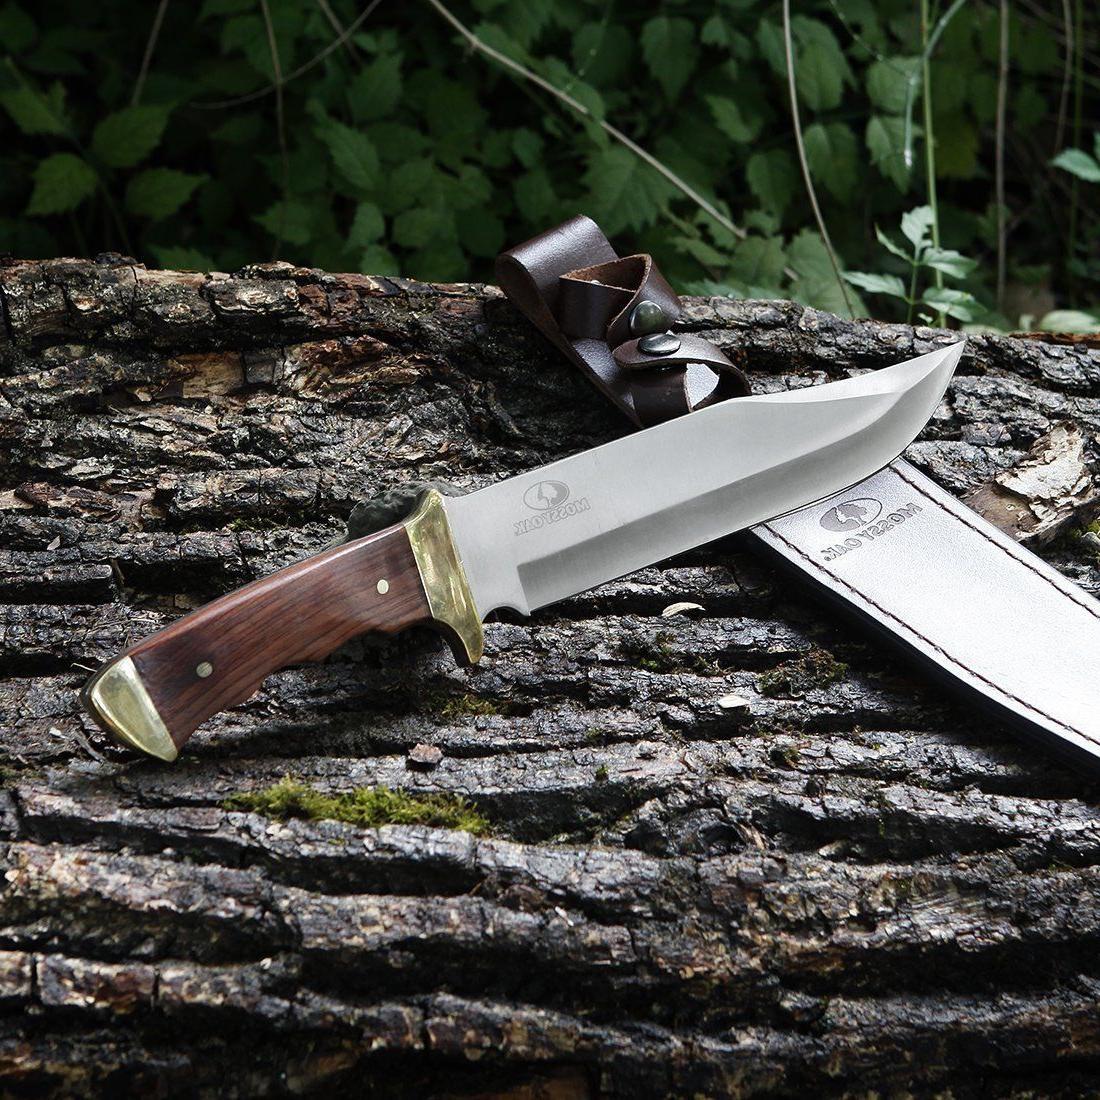 MOSSY OAK 14-inch Knife Wood Leather Sheath